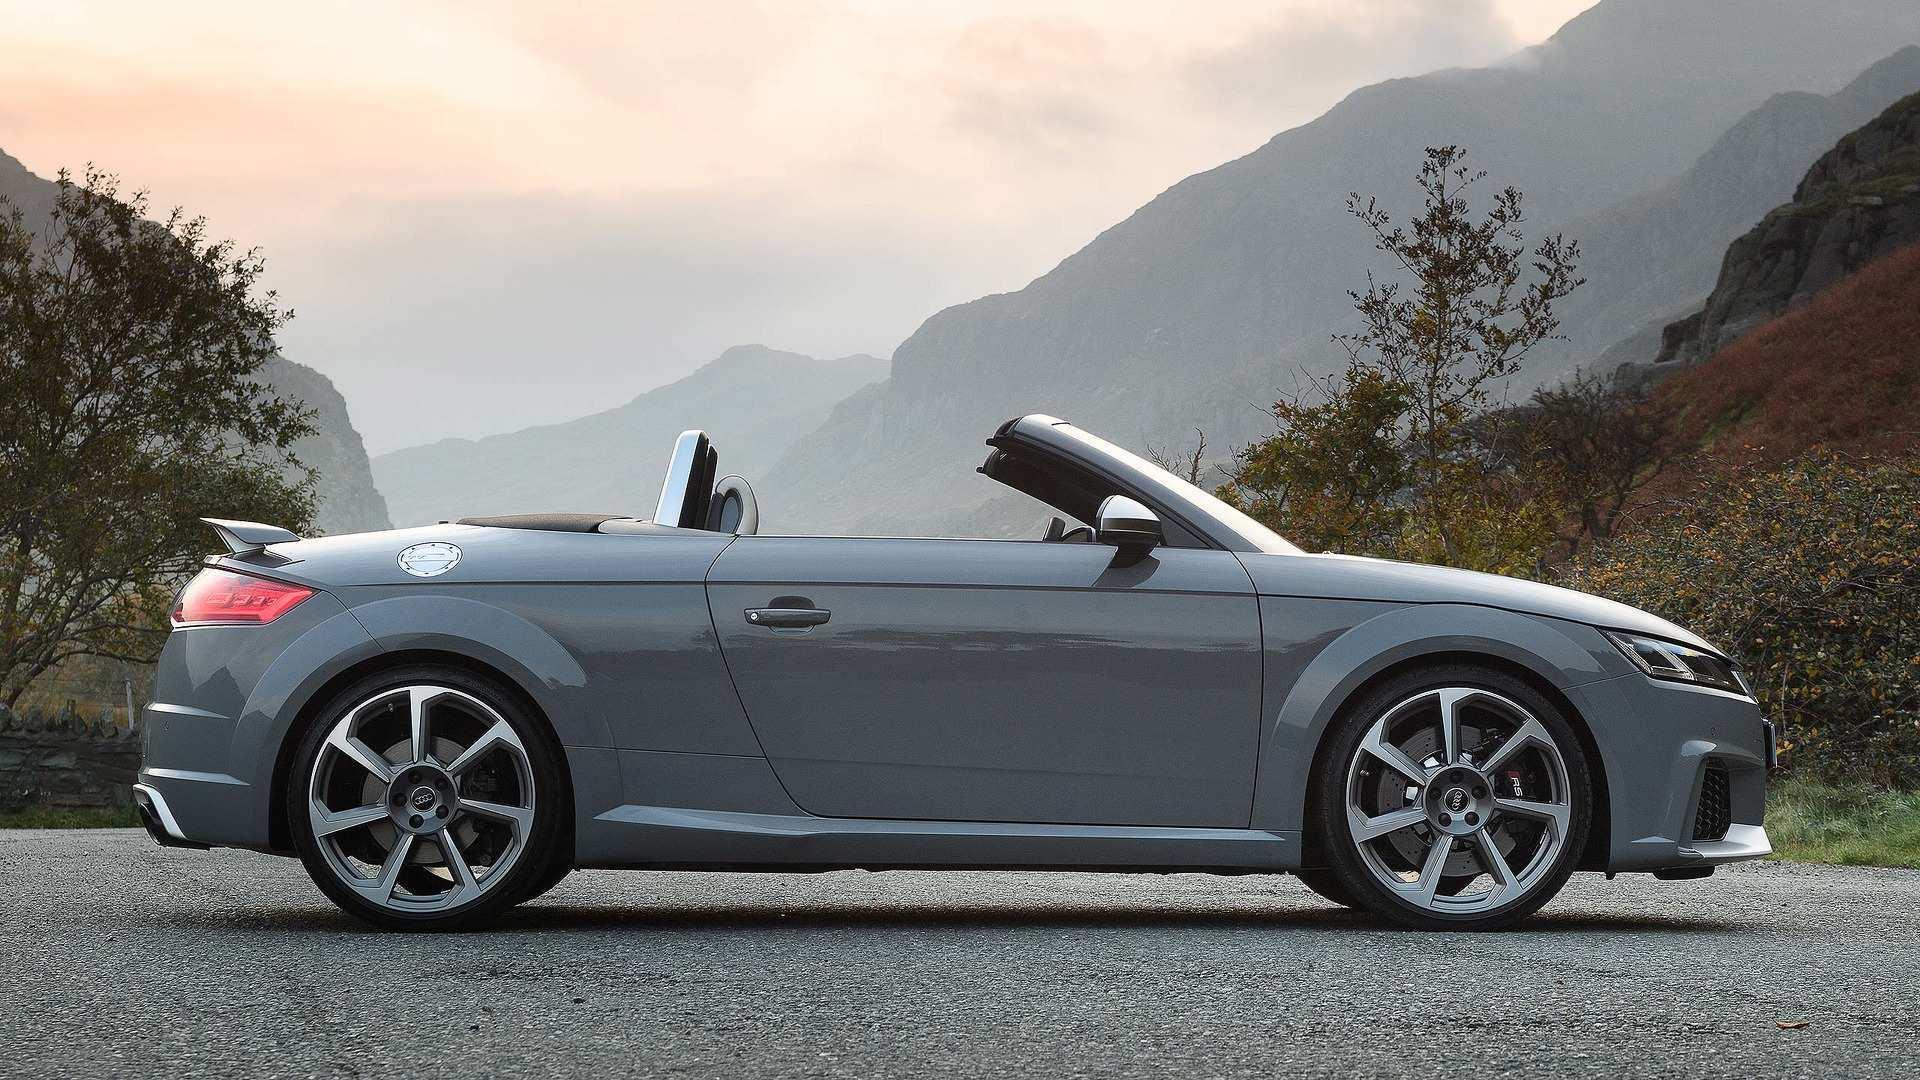 24 Best Review Audi Tt Convertible 2020 Images for Audi Tt Convertible 2020